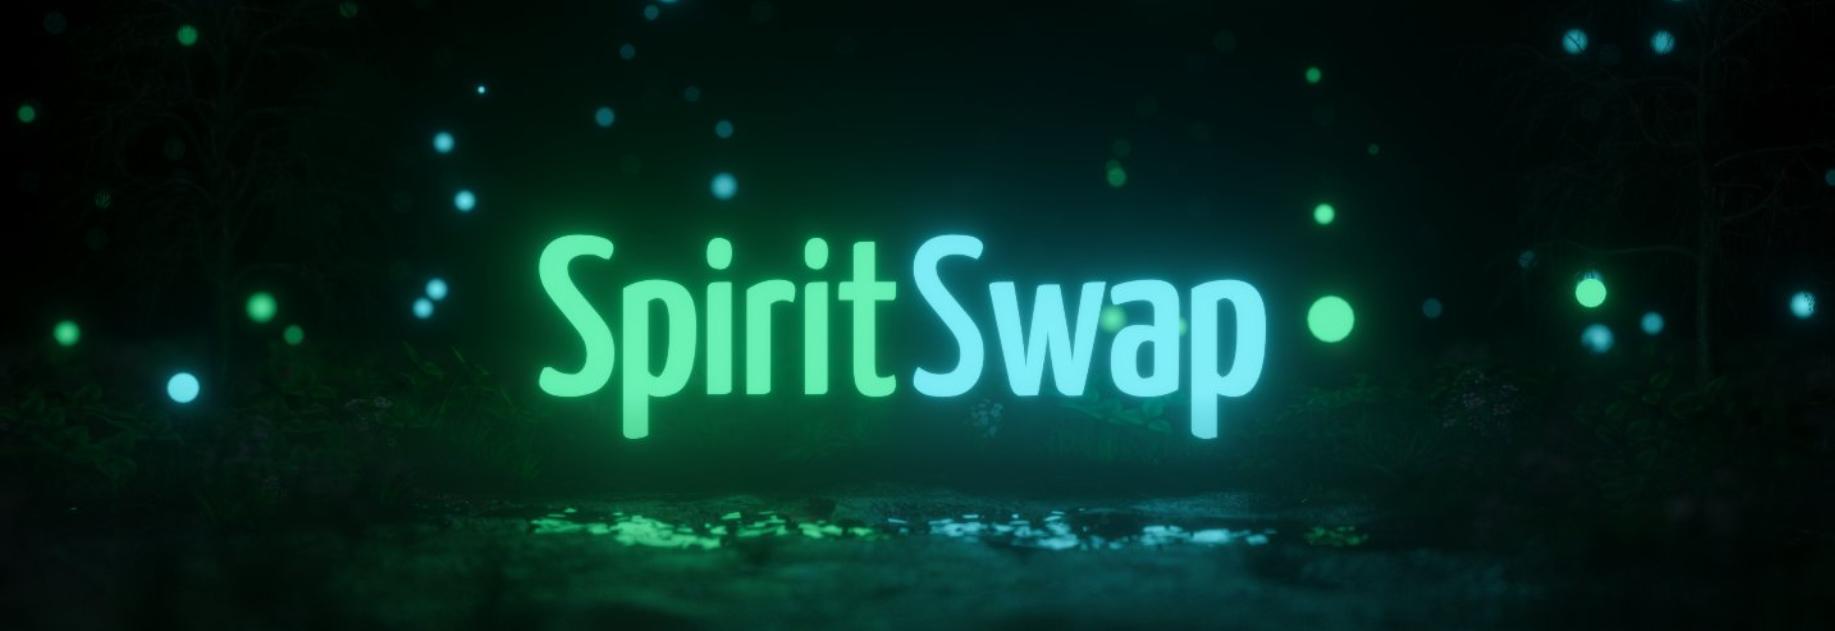 SpiritSwap